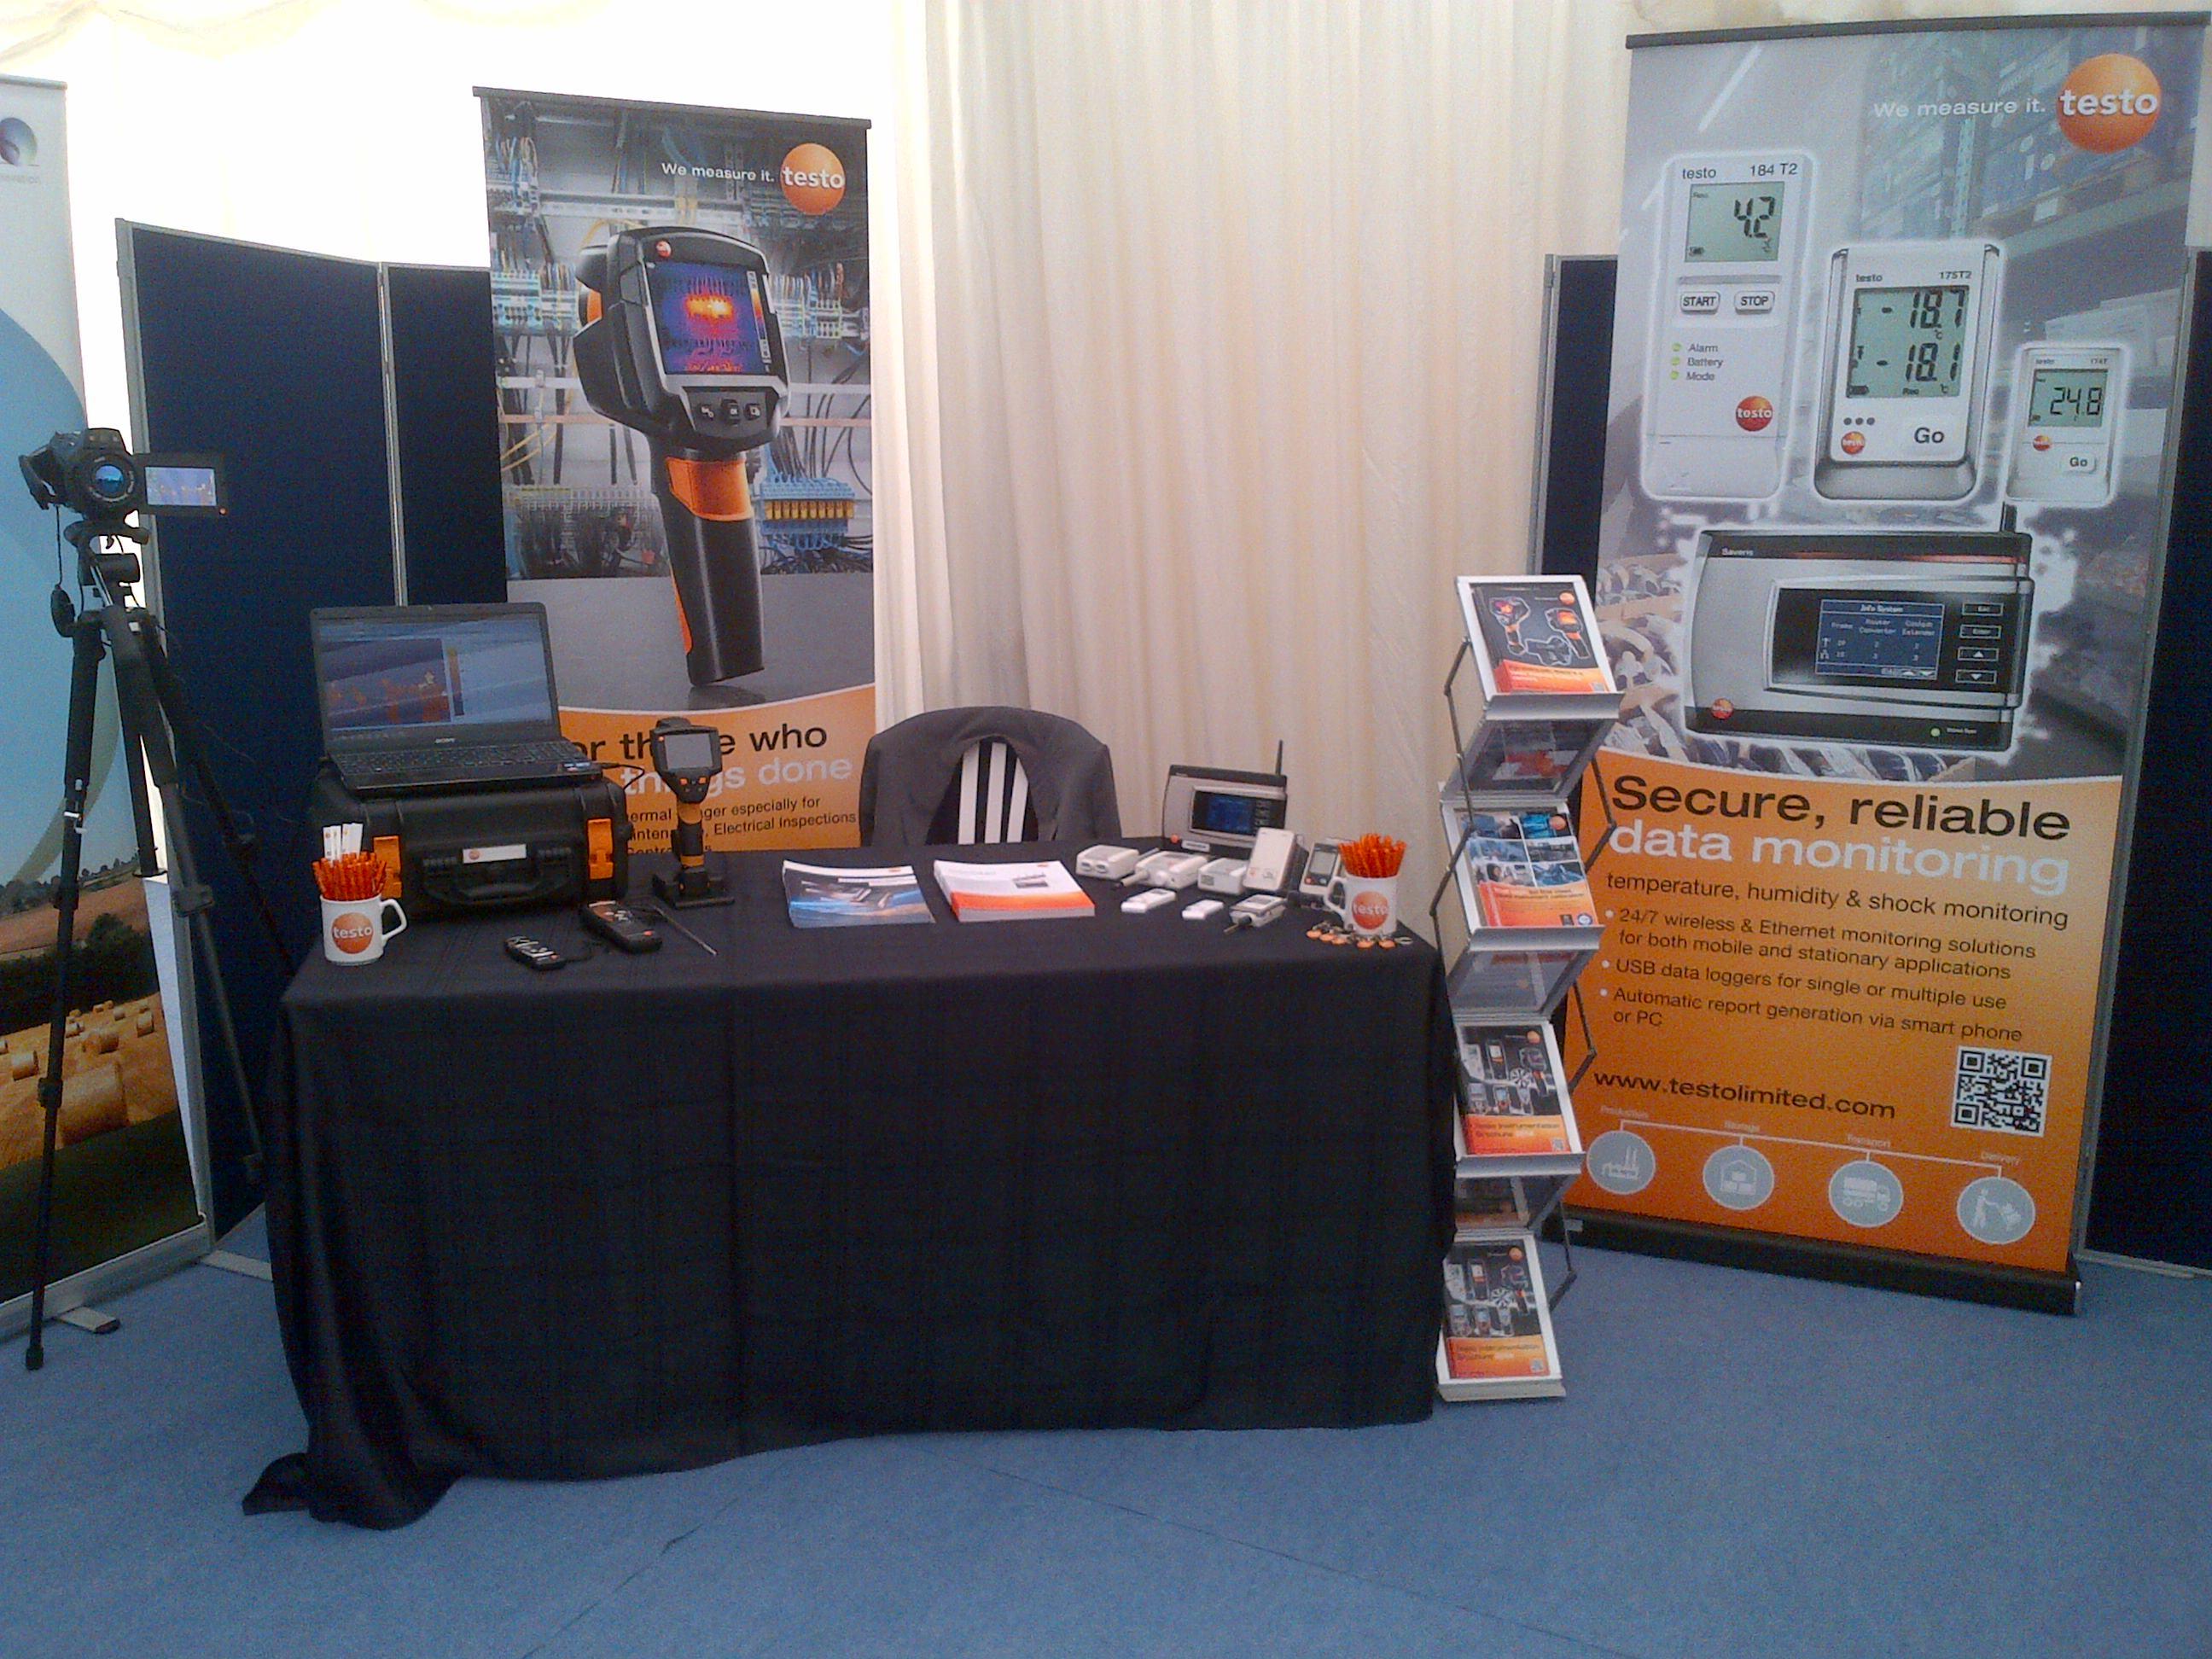 Testo Limited at Campden BRI Thermal Imaging Conference 2014